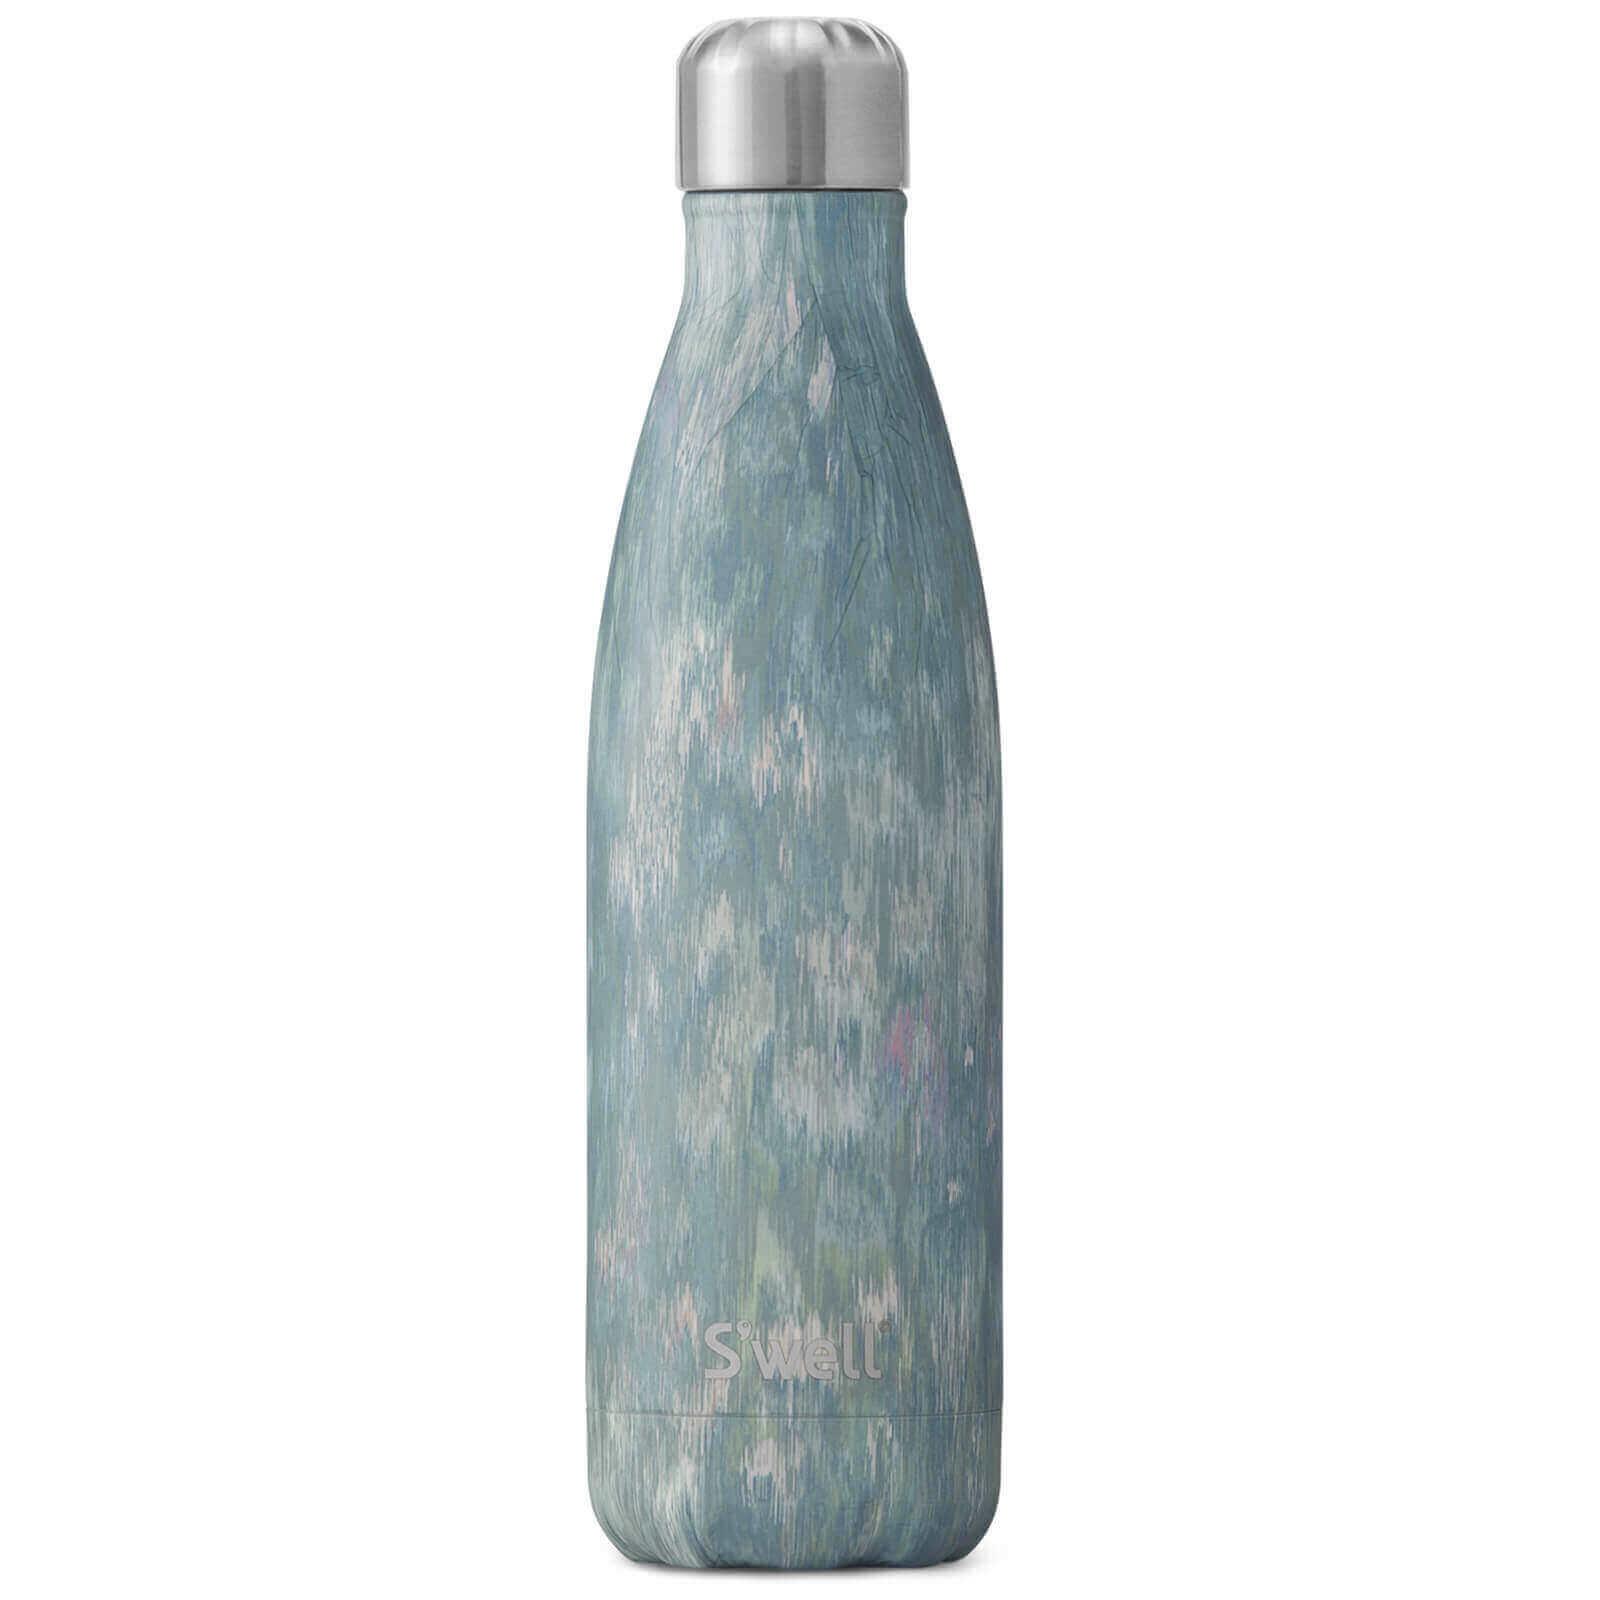 S'well Painted Poppy Water Bottle 500ml